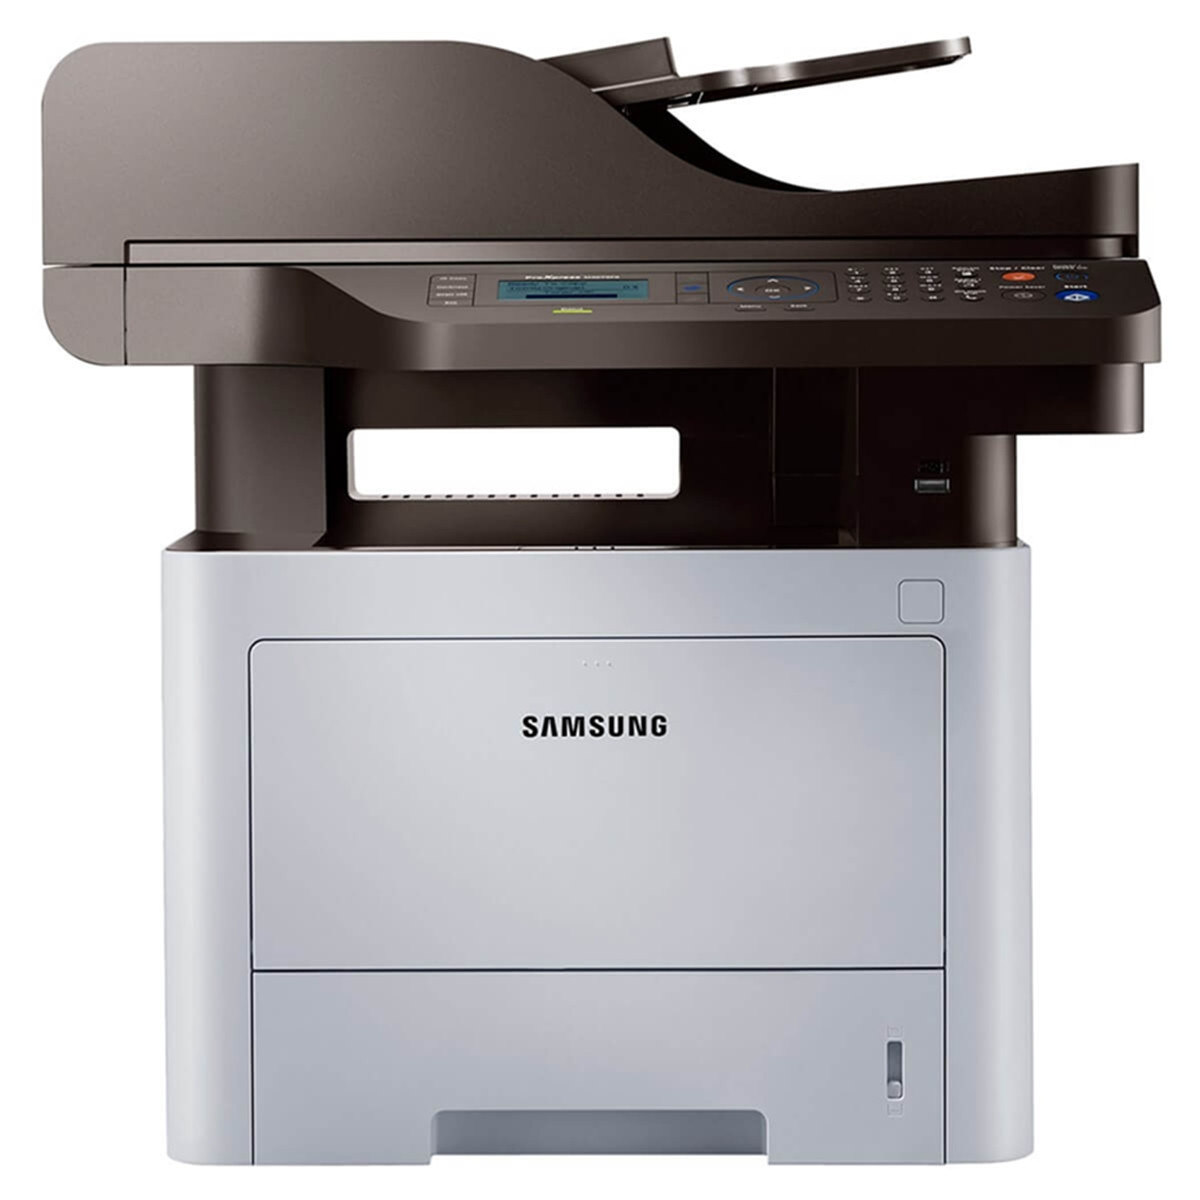 Impressora Samsung M4070FR M4070 SL-M4070FR Monocromática Multifuncional Pro Xpress